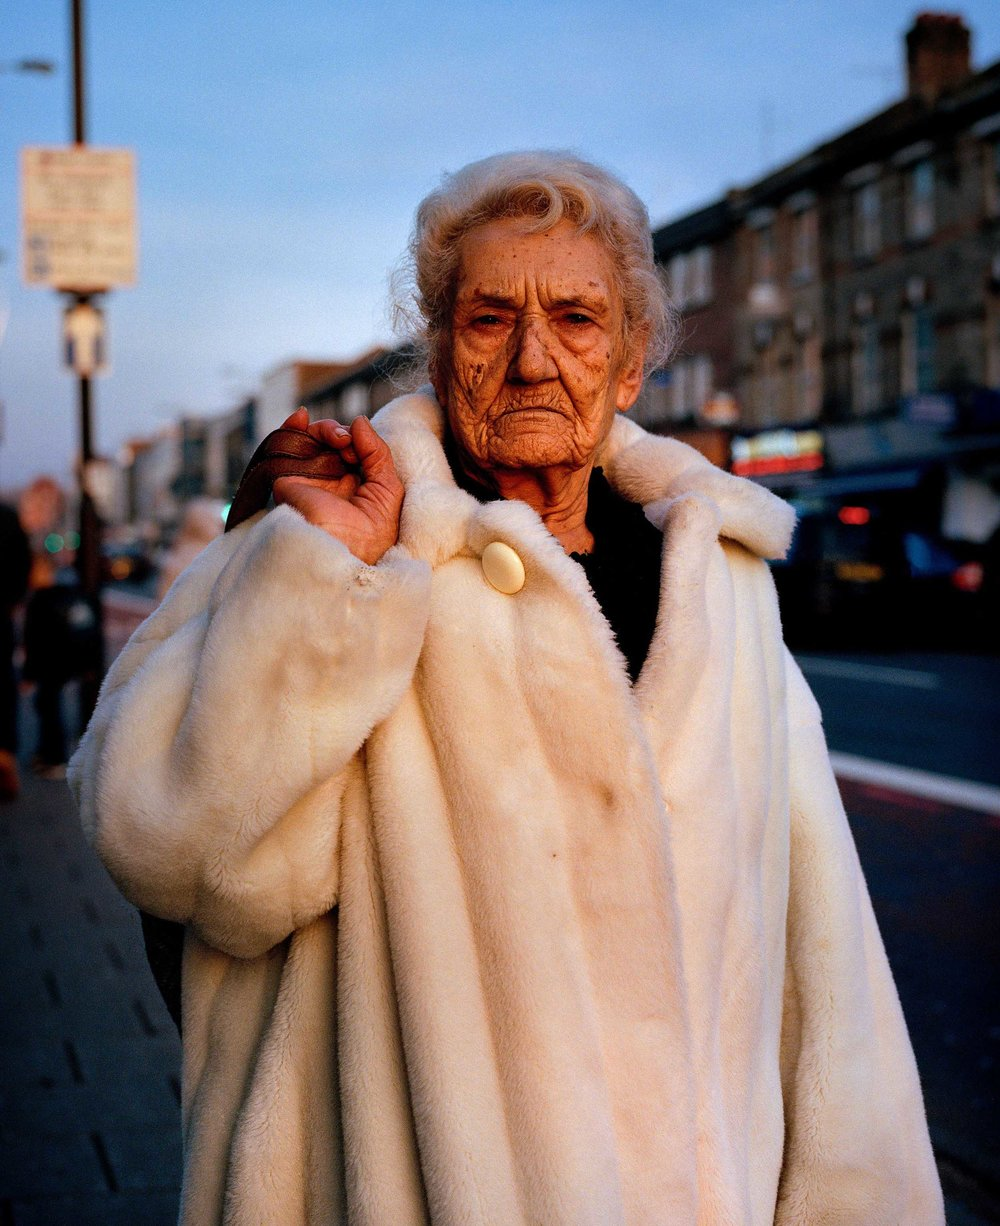 7-blighty-england-london-sam-gregg-photography.jpg